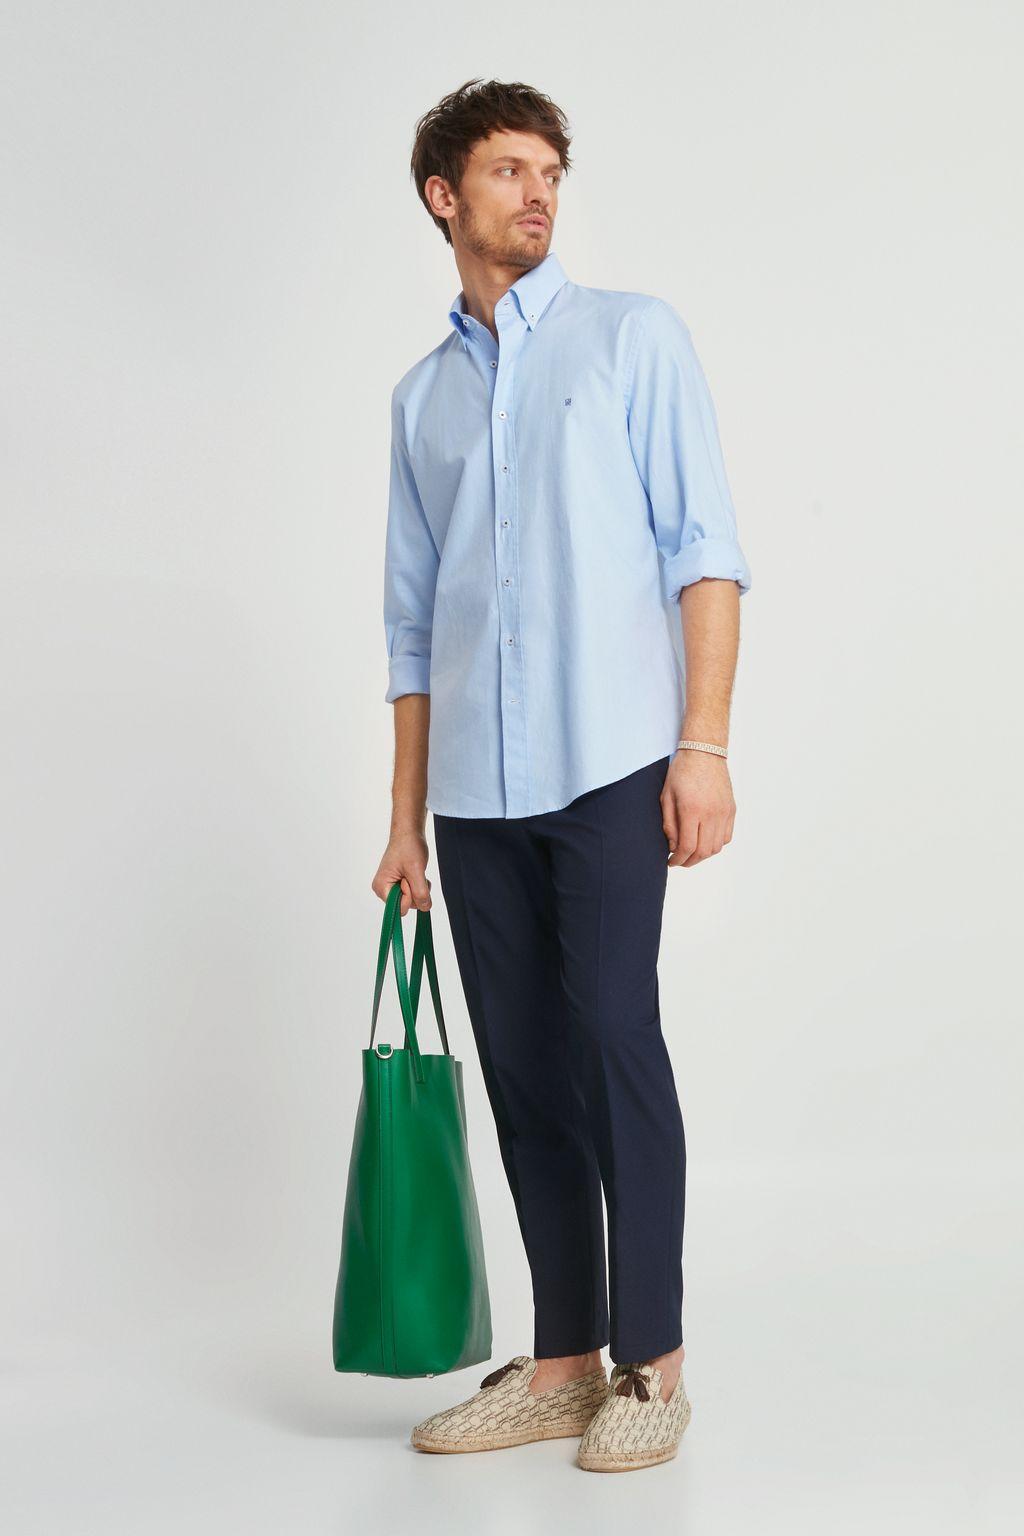 Oxford shirt